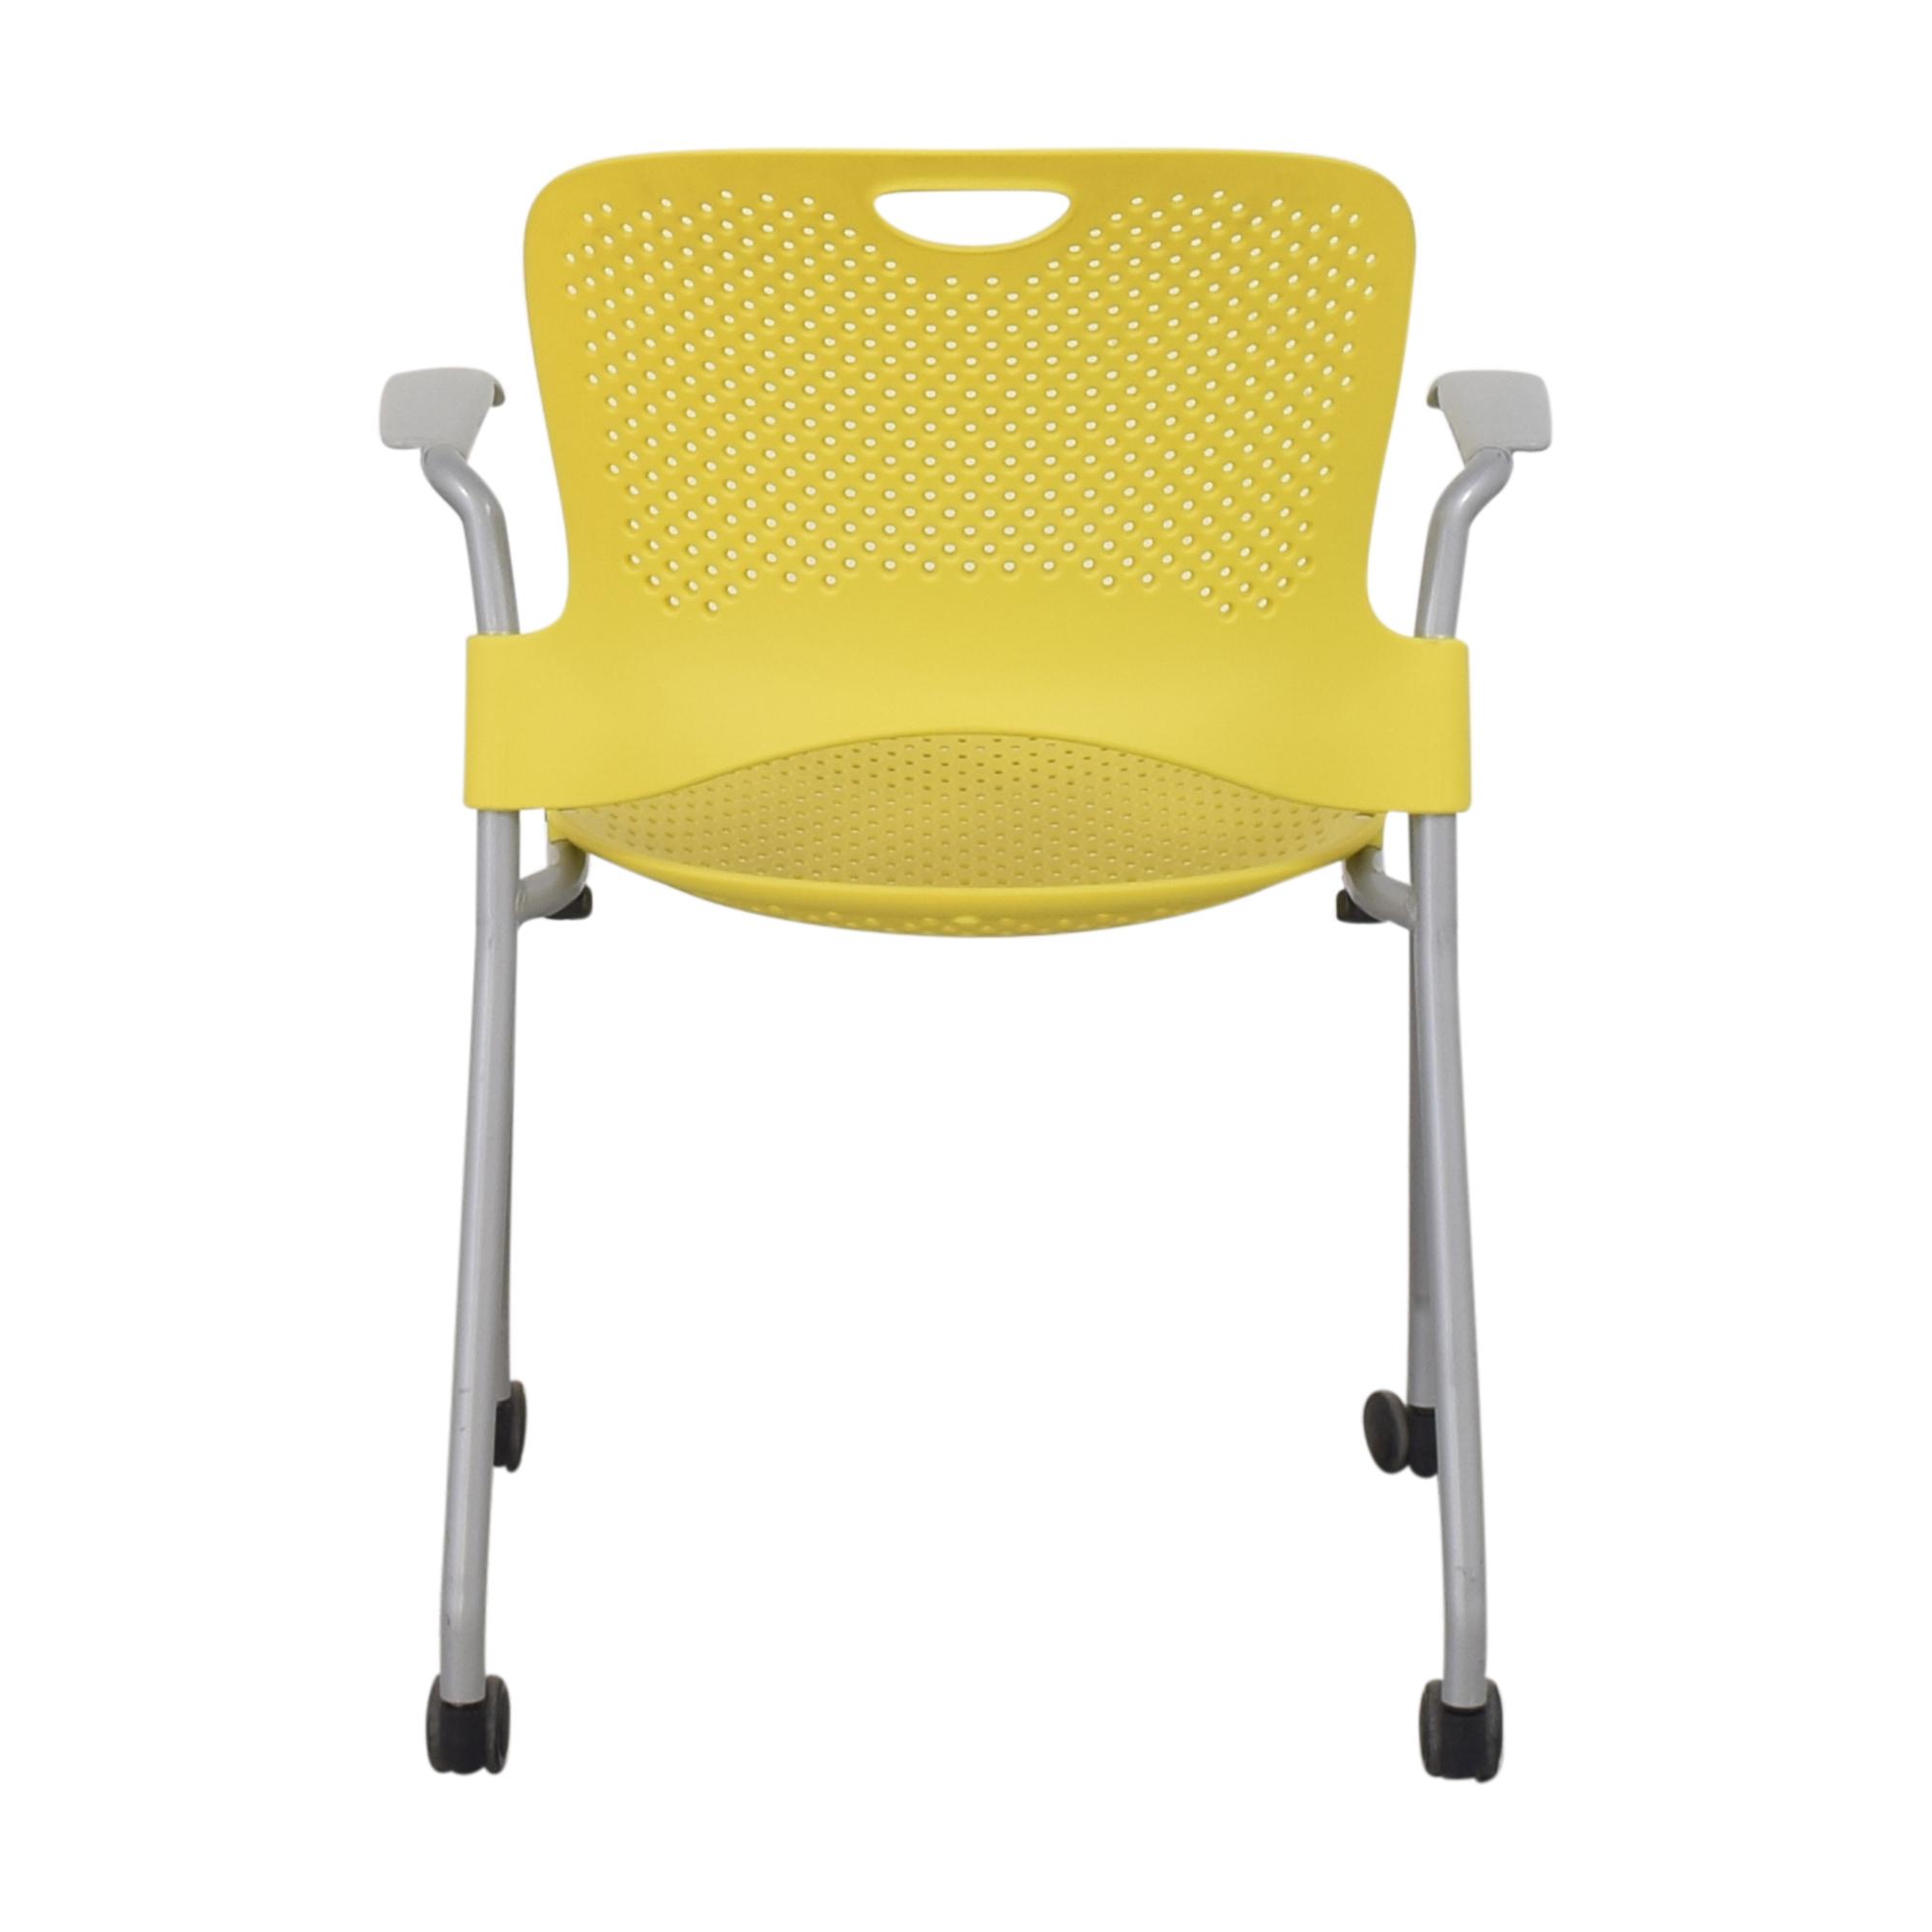 Herman Miller Herman Miller Caper Stacking Chair on sale